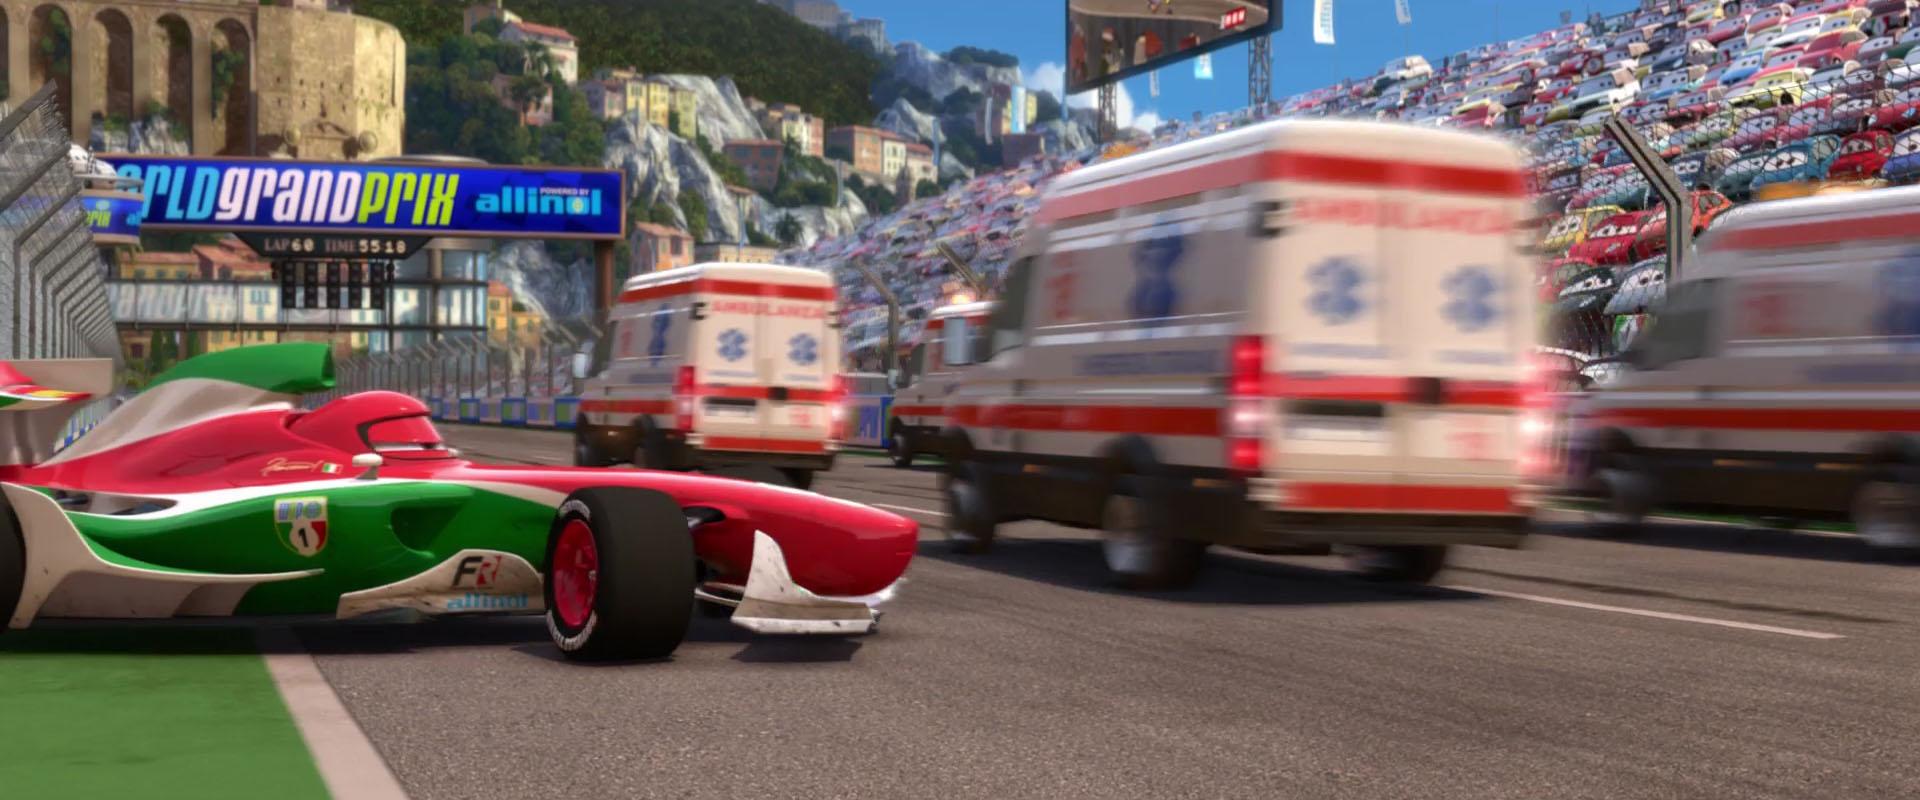 Alfredo Personnage Dans Cars 2 Pixar Planet Fr